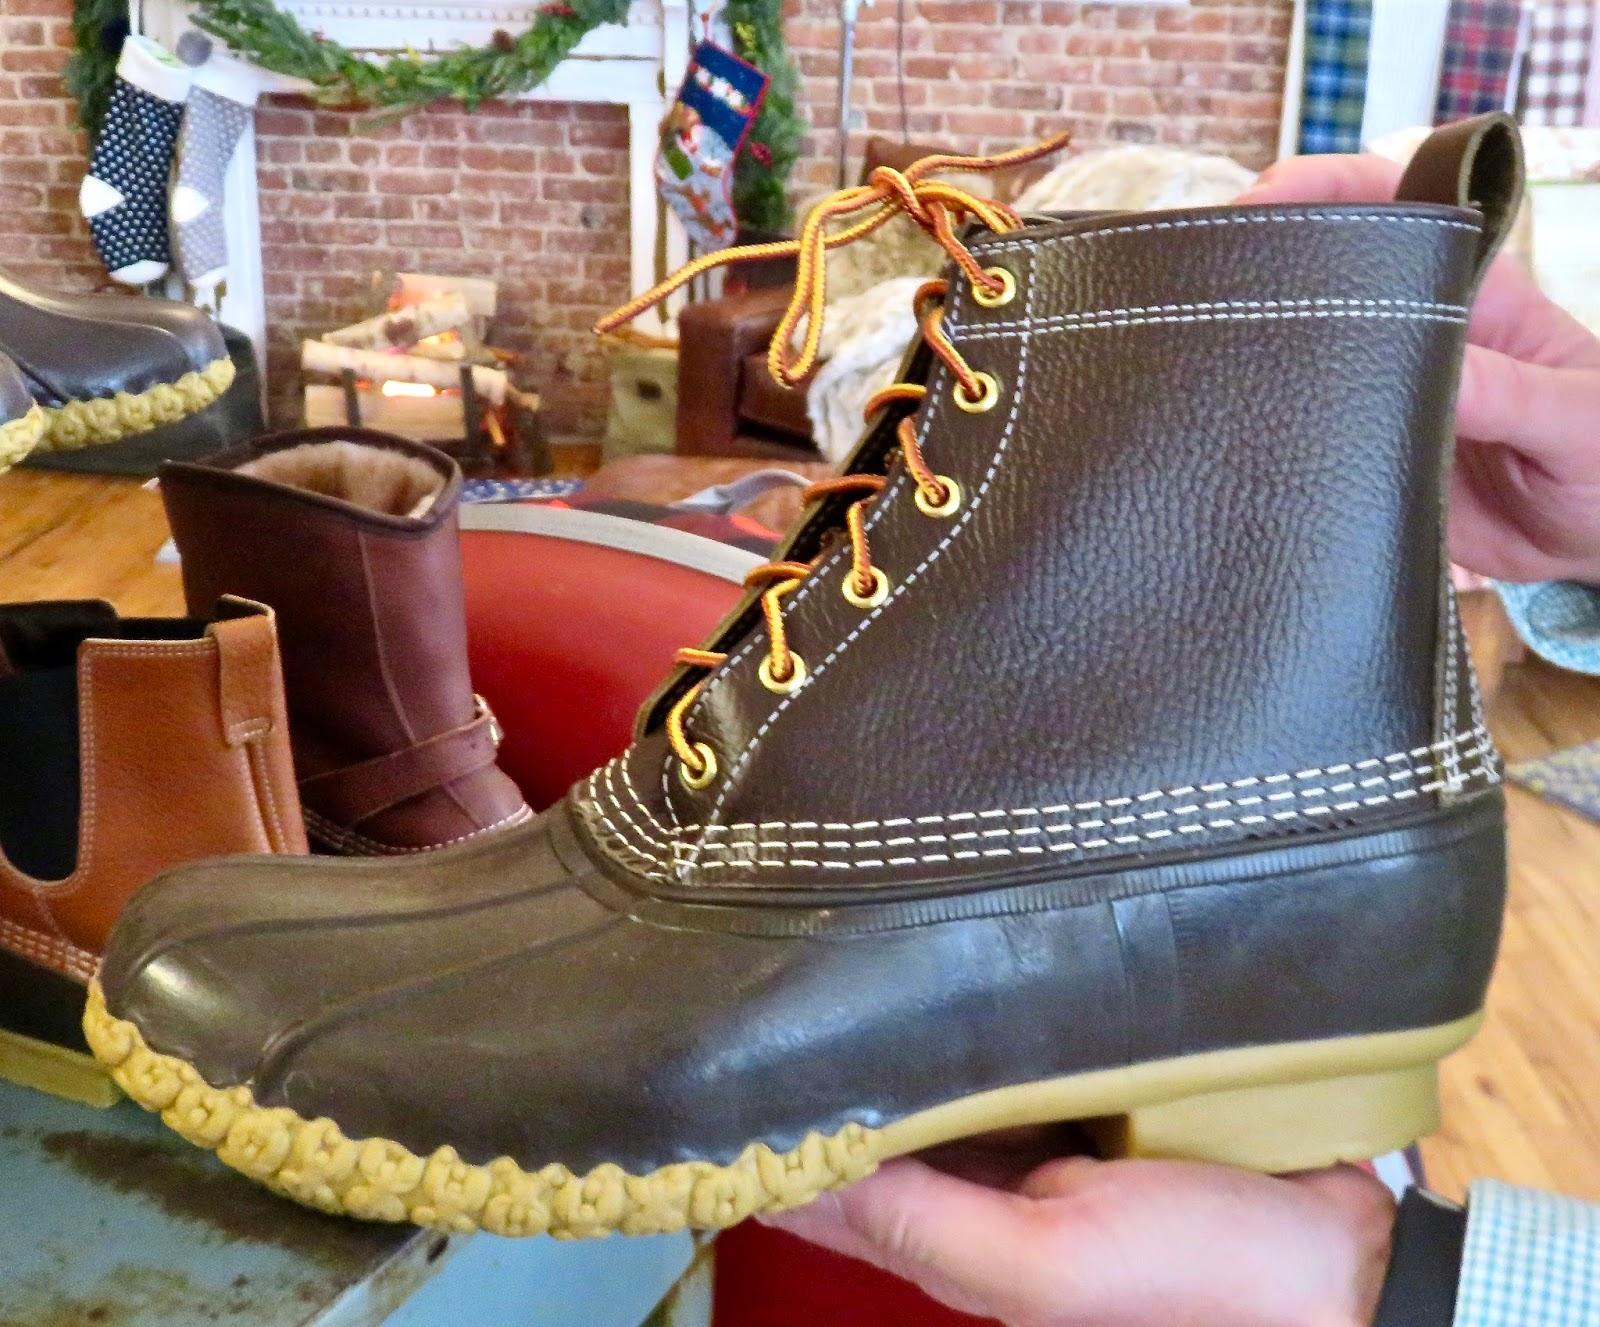 c66d61bbc3f L.L.BEAN ORIGINAL BOOTS: Classics, New Styles-and Available!